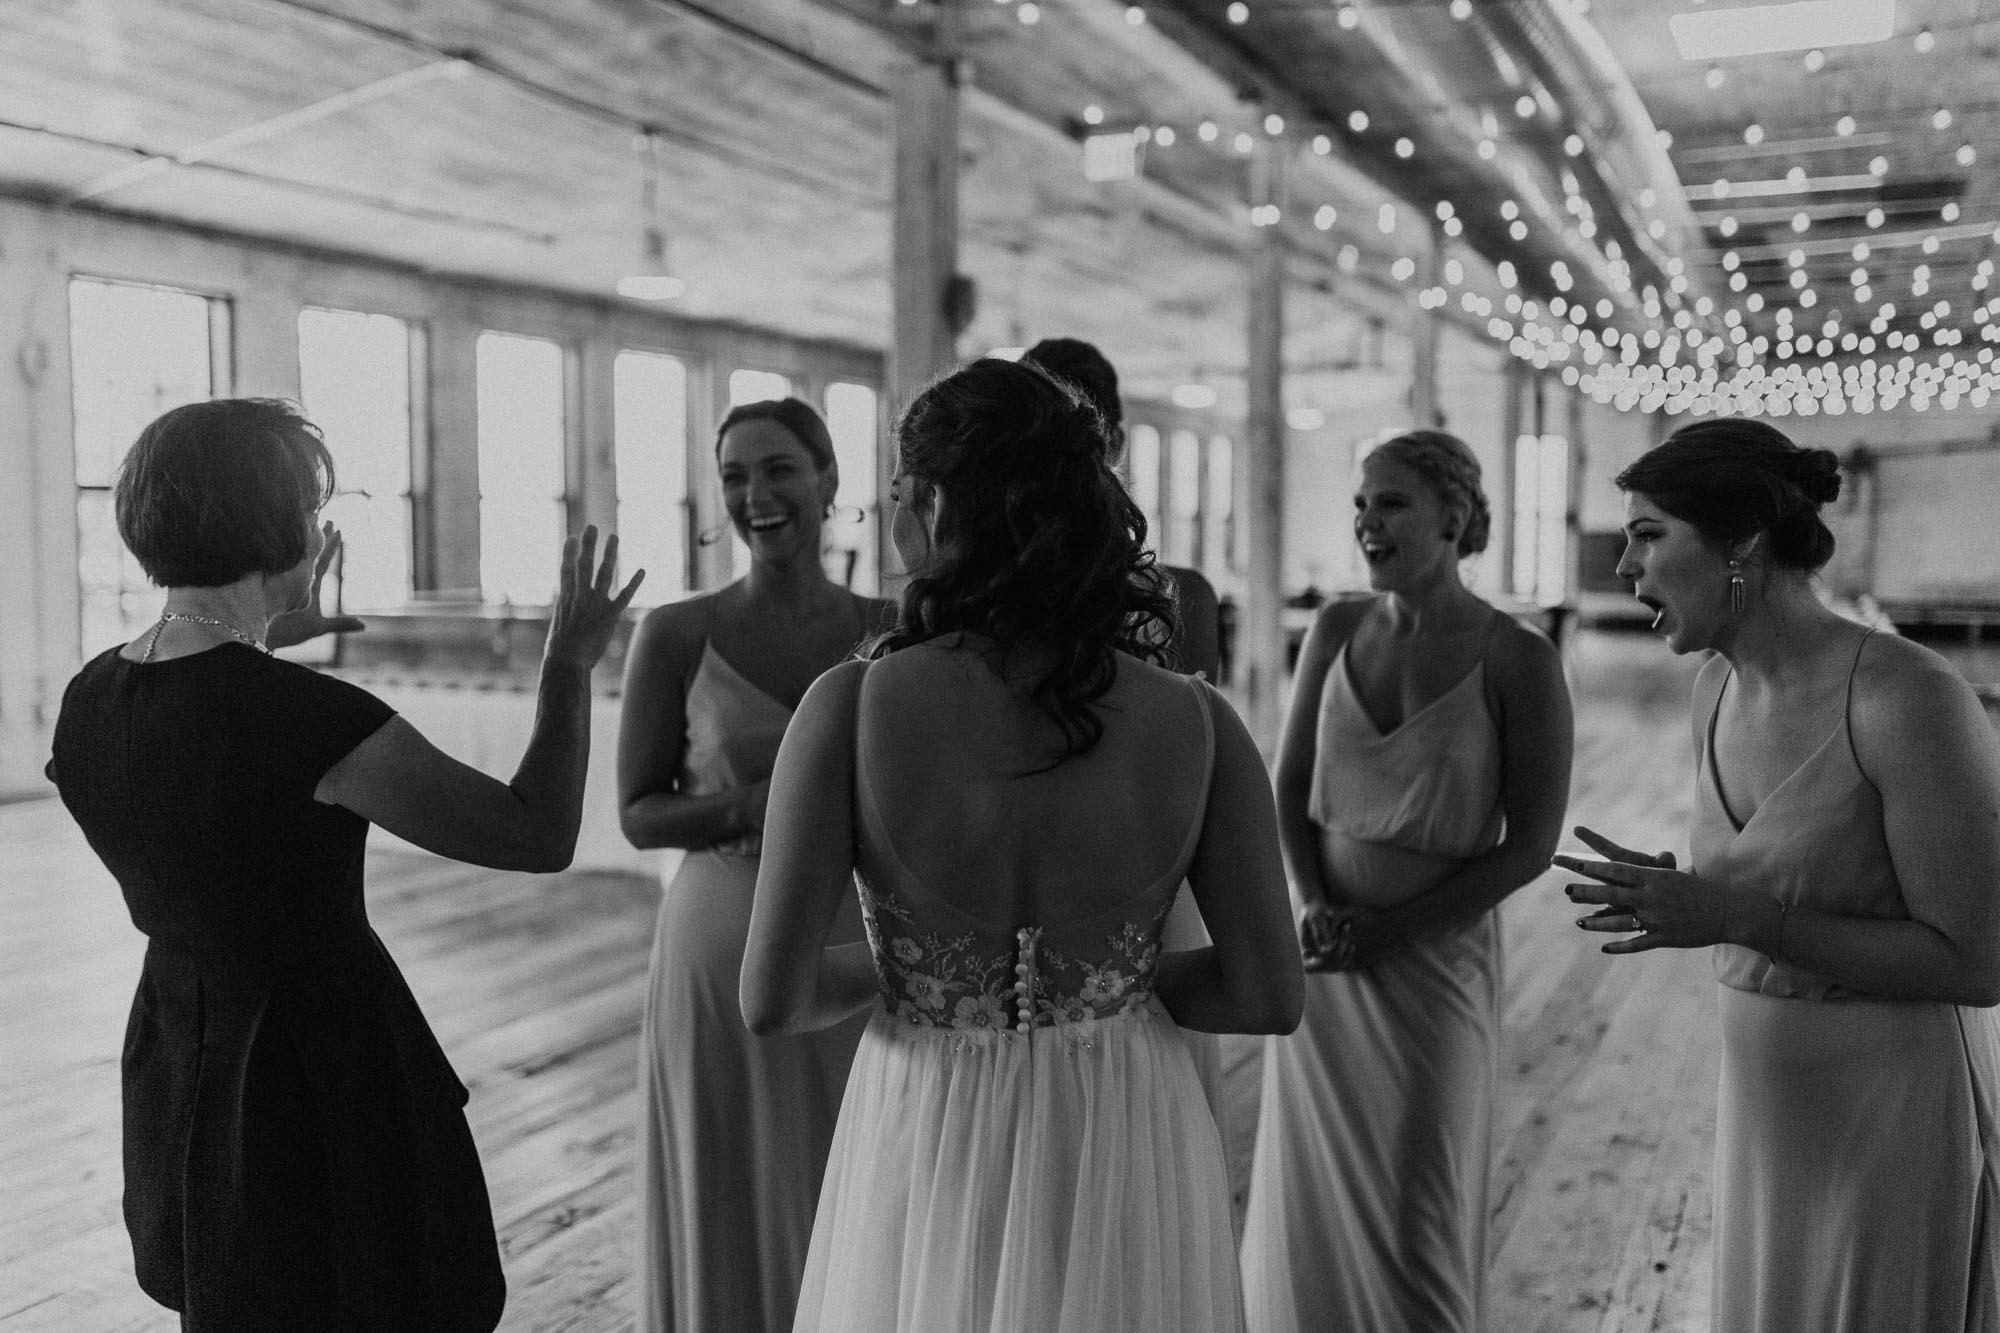 journeyman_distillery_wedding_photographer_chicago_il_wright_photographs-1034.jpg